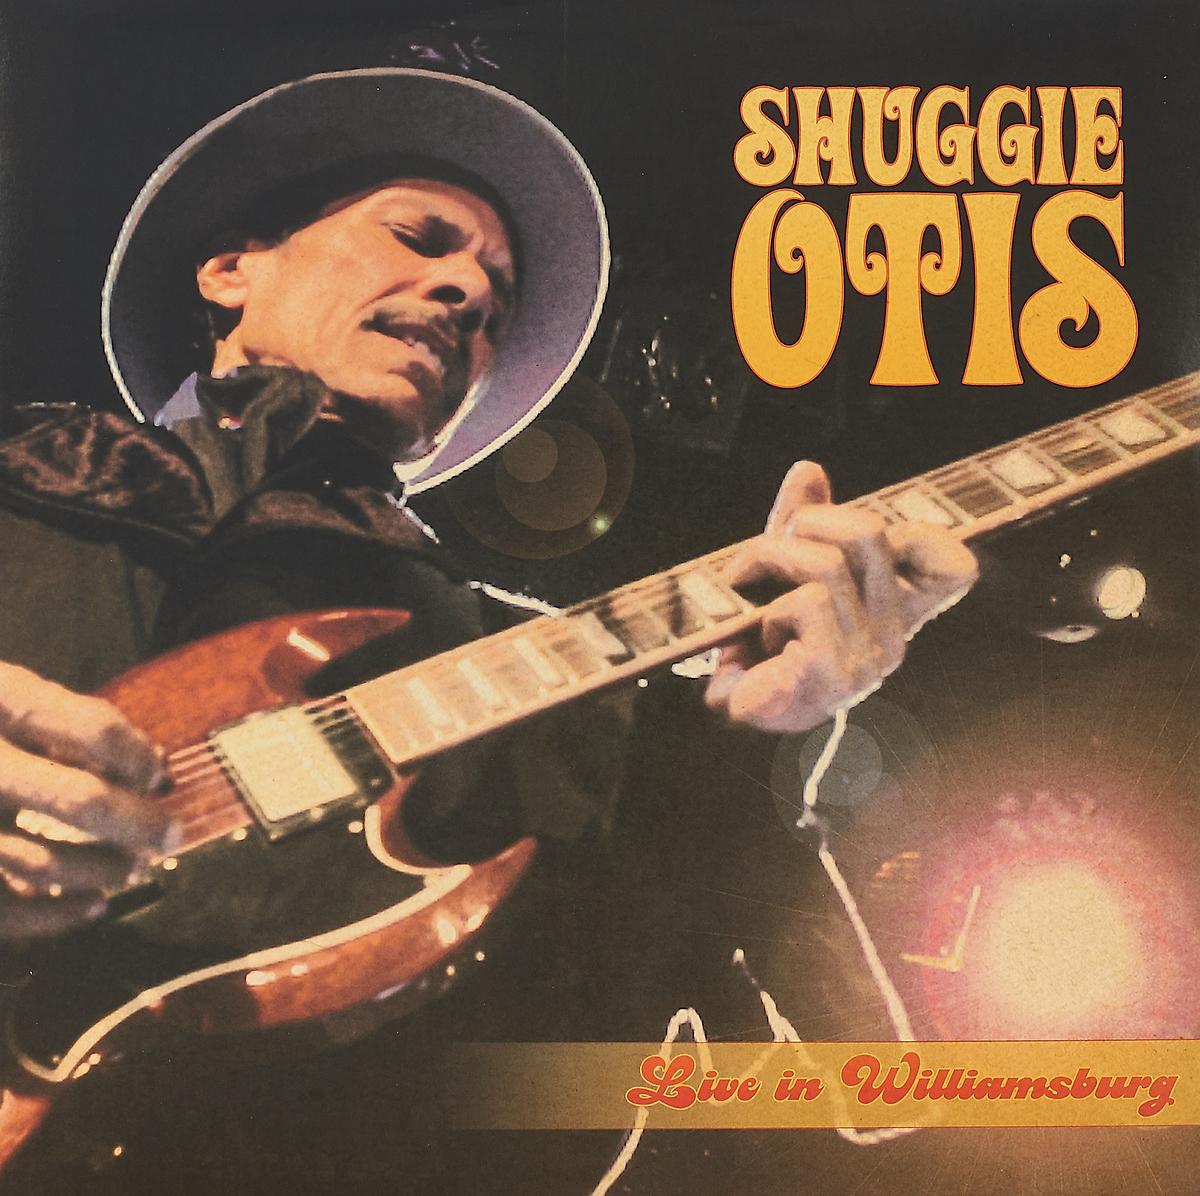 Шугги Отис Shuggie Otis. Live In Williamsburg (LP) otis redding otis redding live in europe 50th anniversary